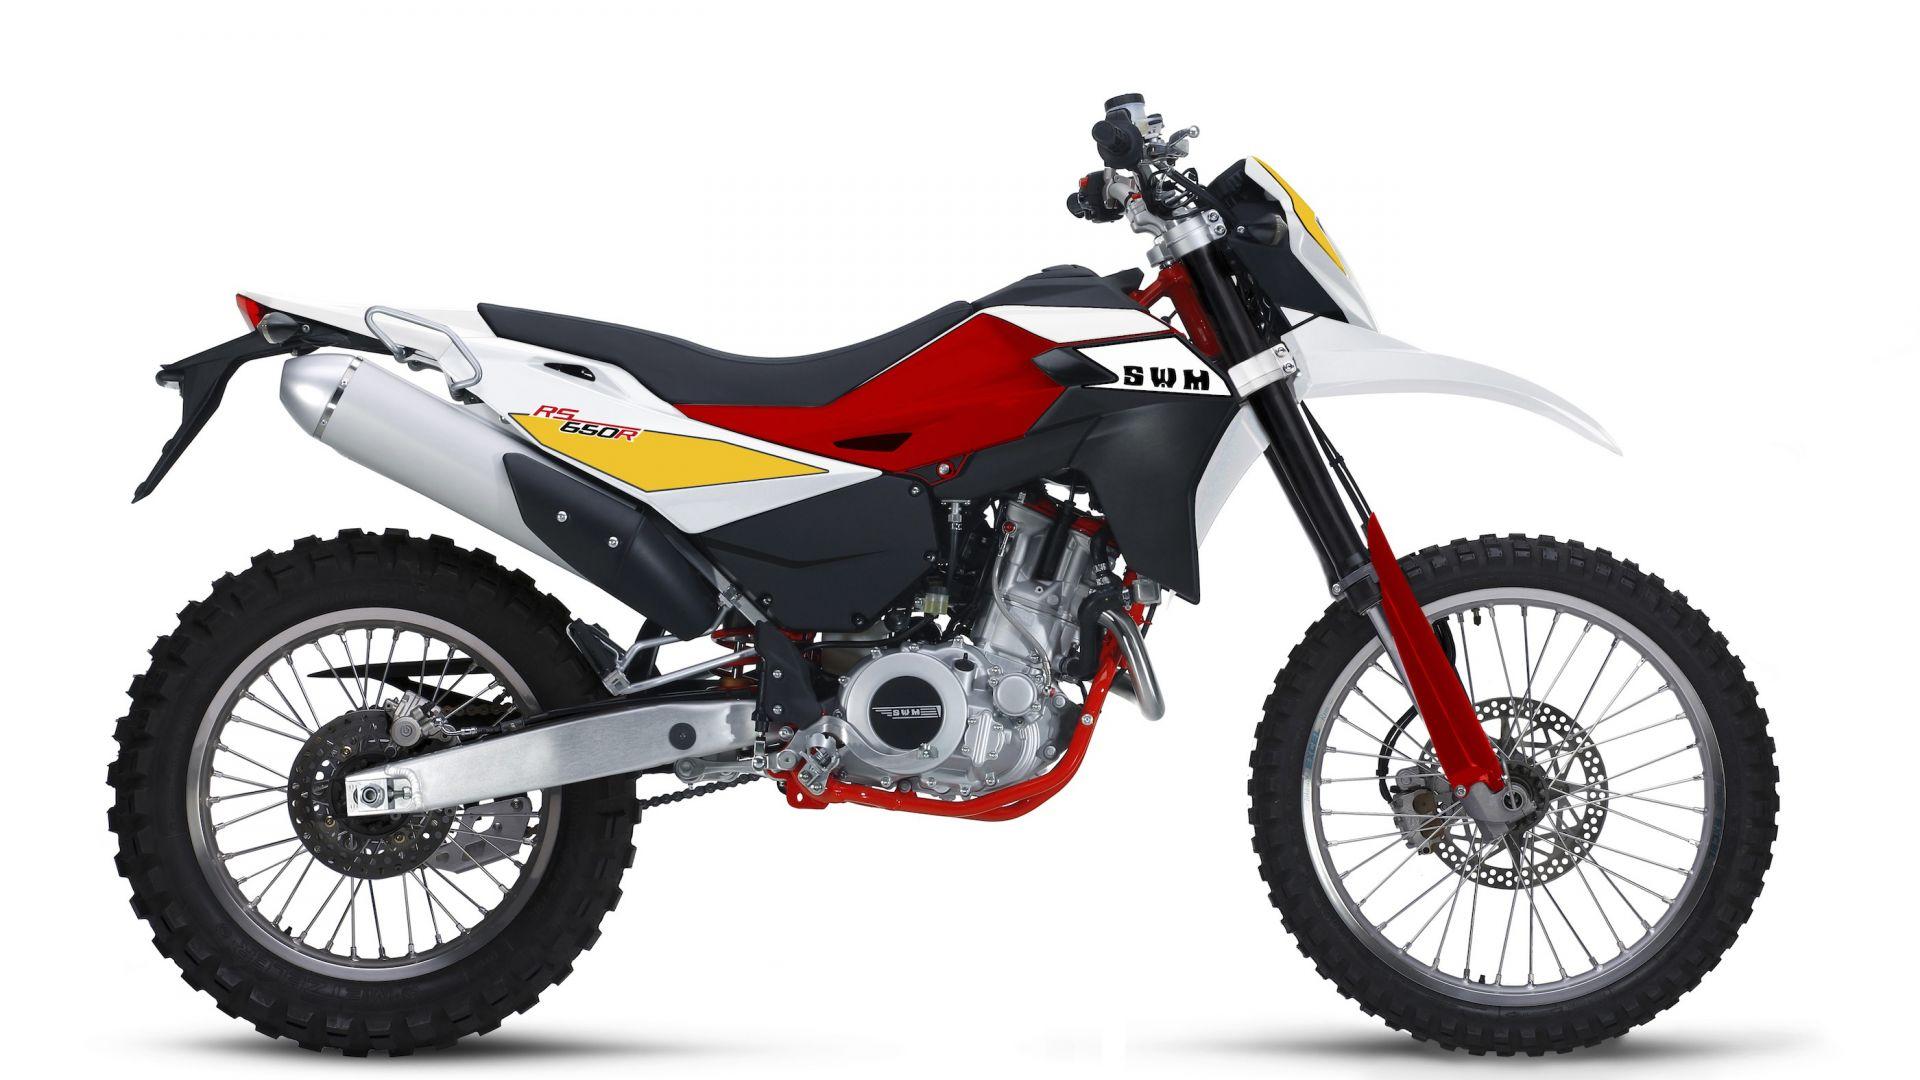 Novit 224 Moto Swm Rs 650 R Motorbox